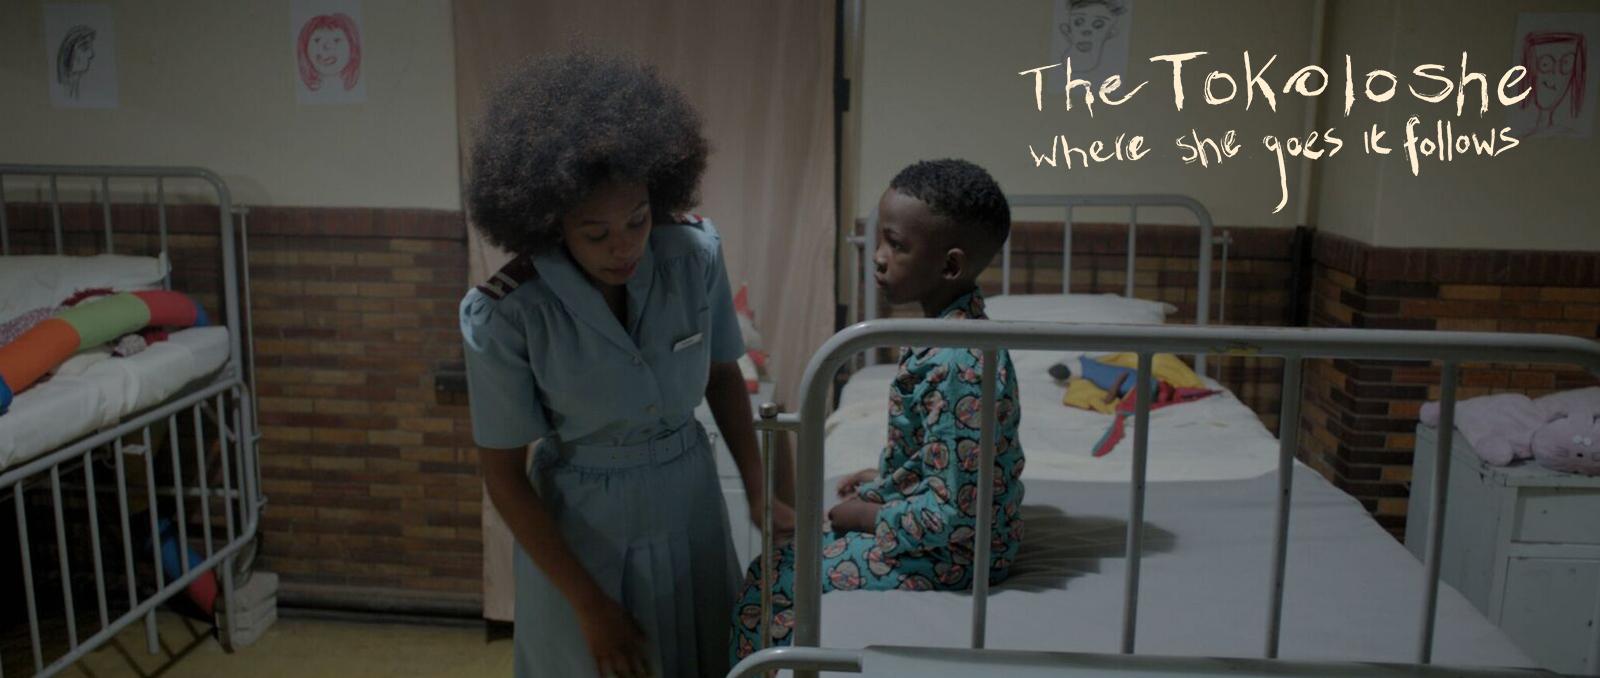 The Tokoloshe, Jerome Pikwane